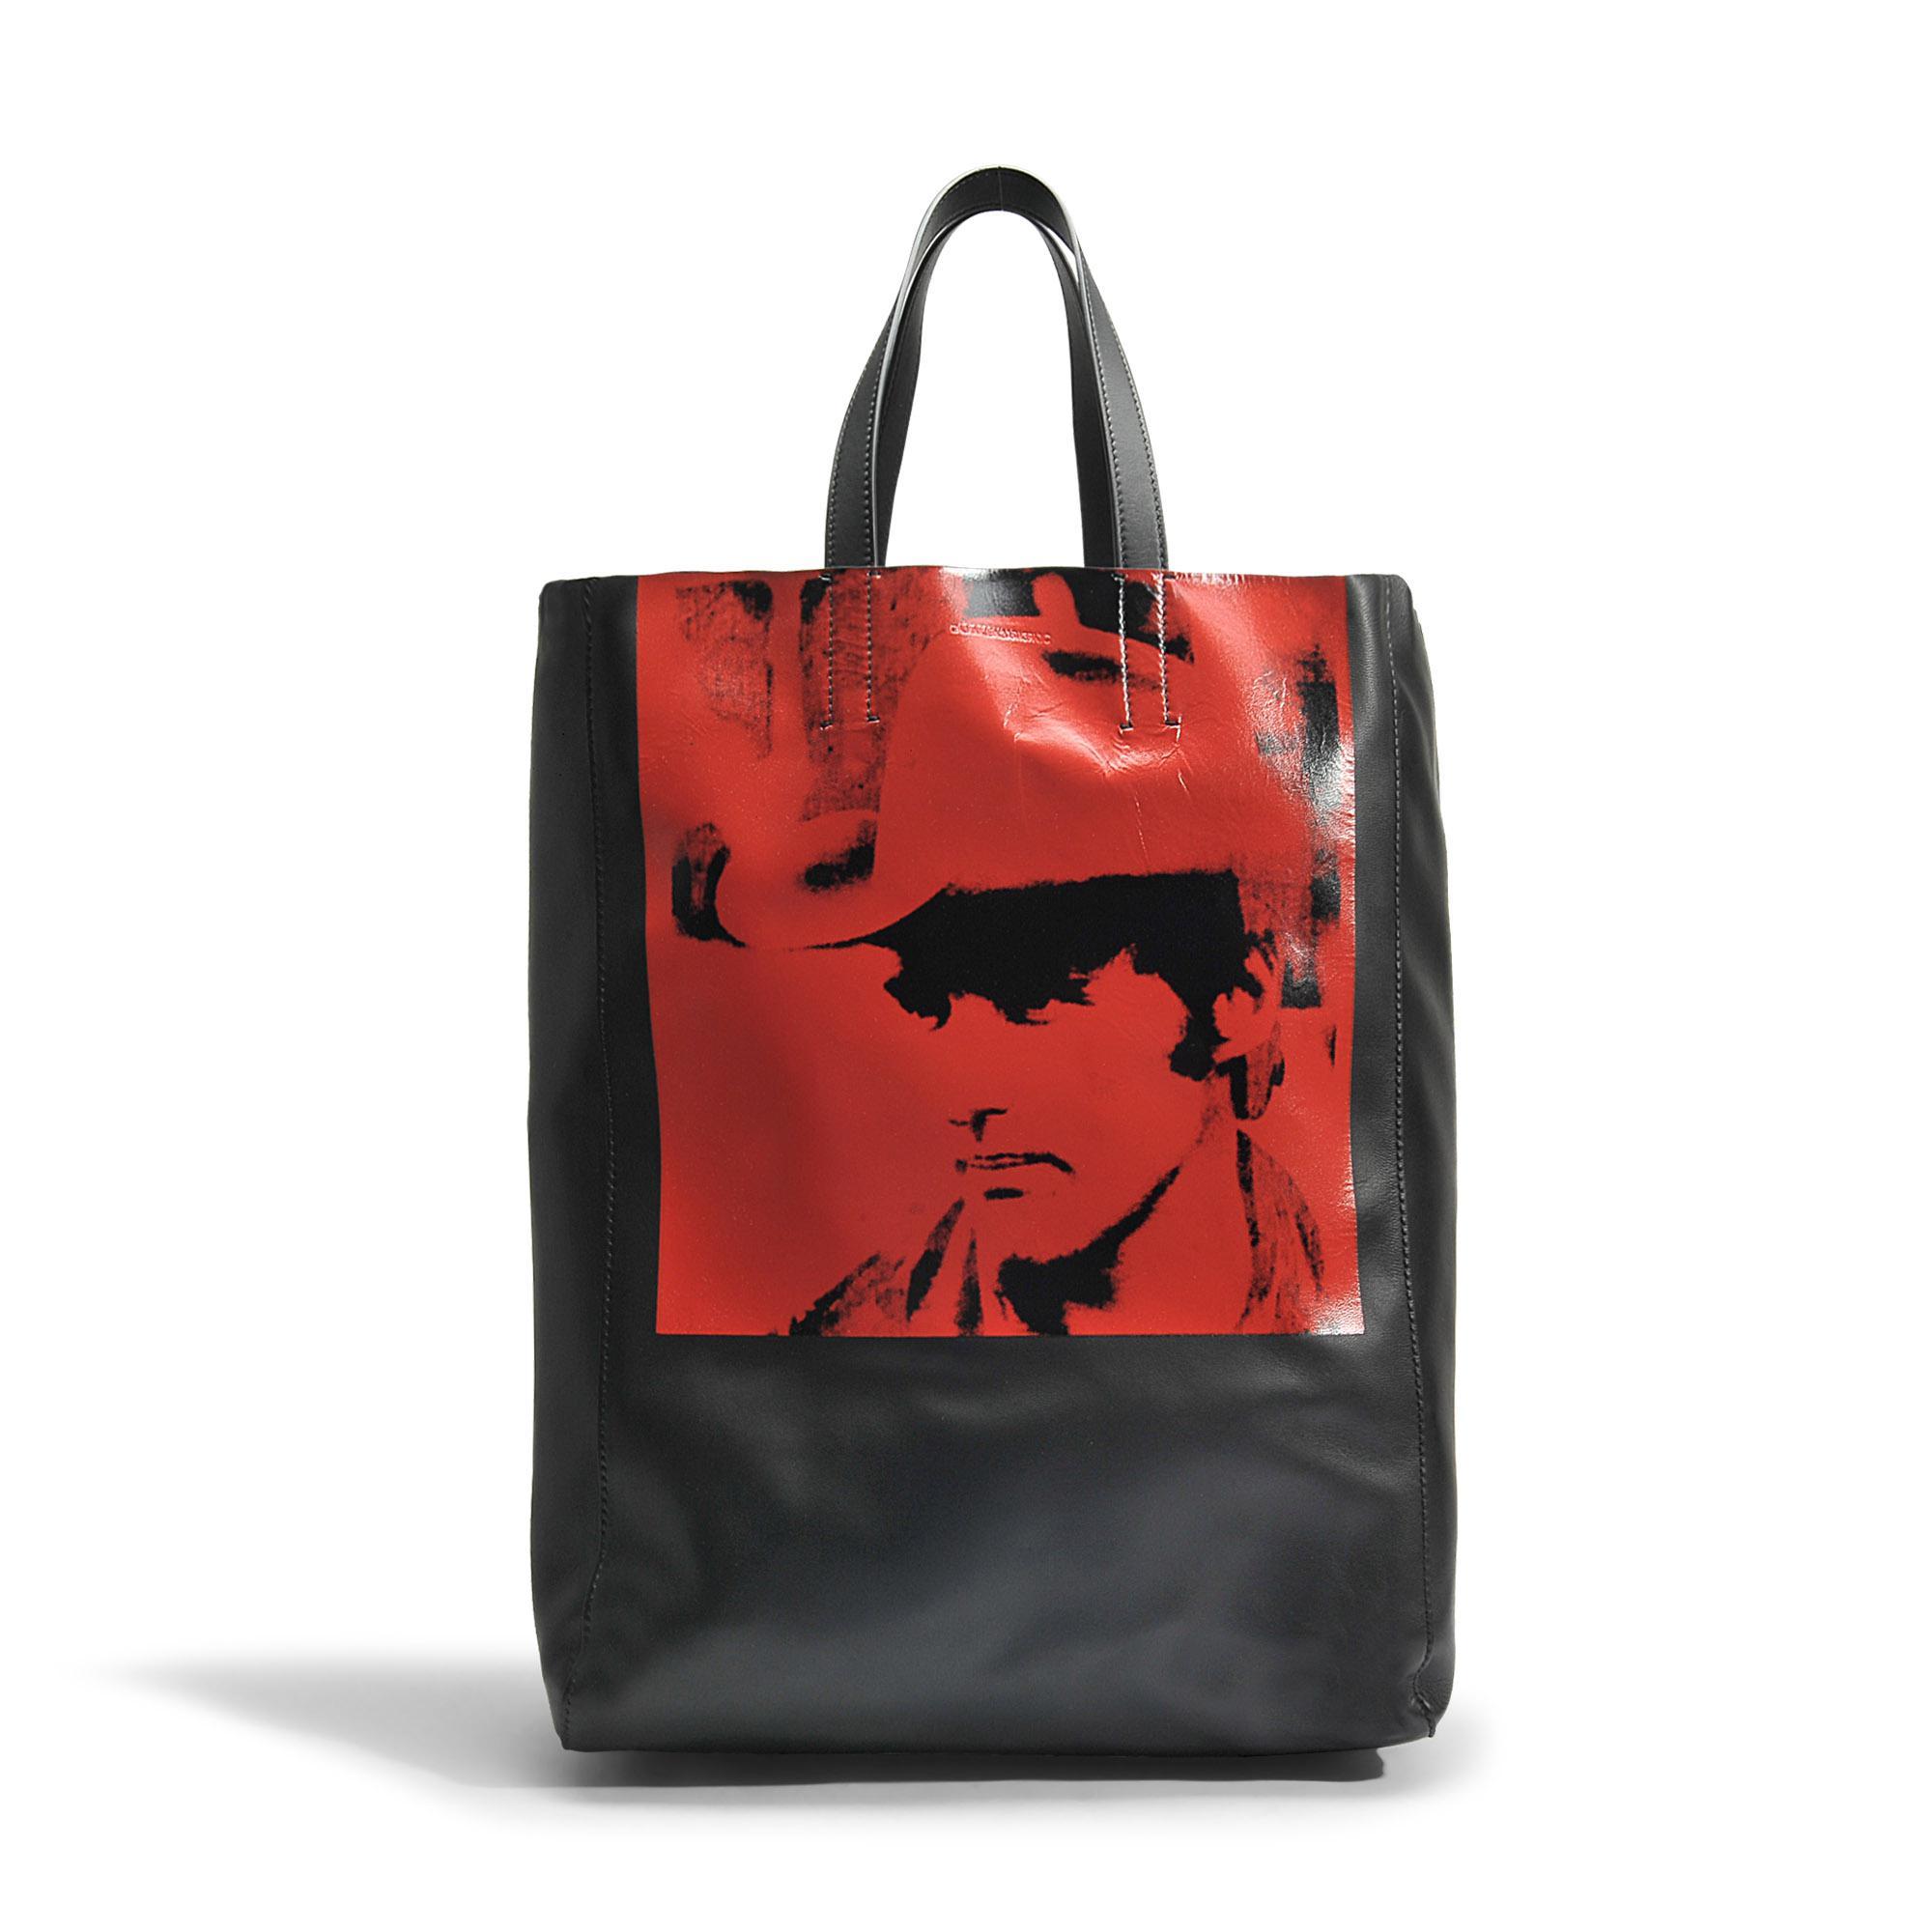 CALVIN KLEIN 205W39NYC Andy Warhol Dennis Hopper Tote Bag ZCPKNBAojk